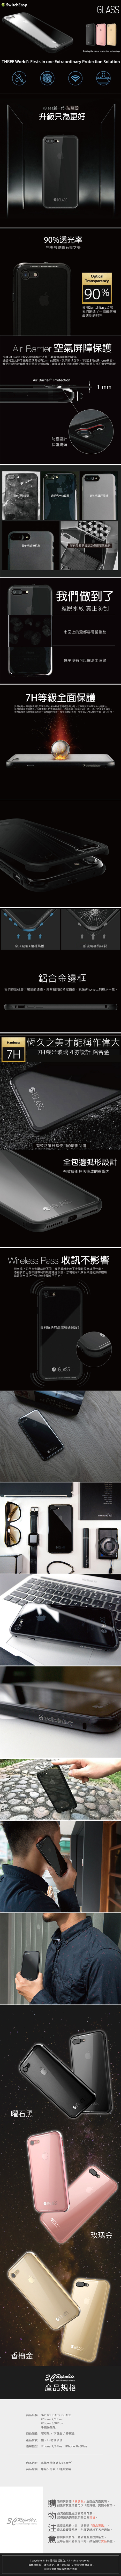 switcheasy iphone7_7plus iphone8_8plus glass